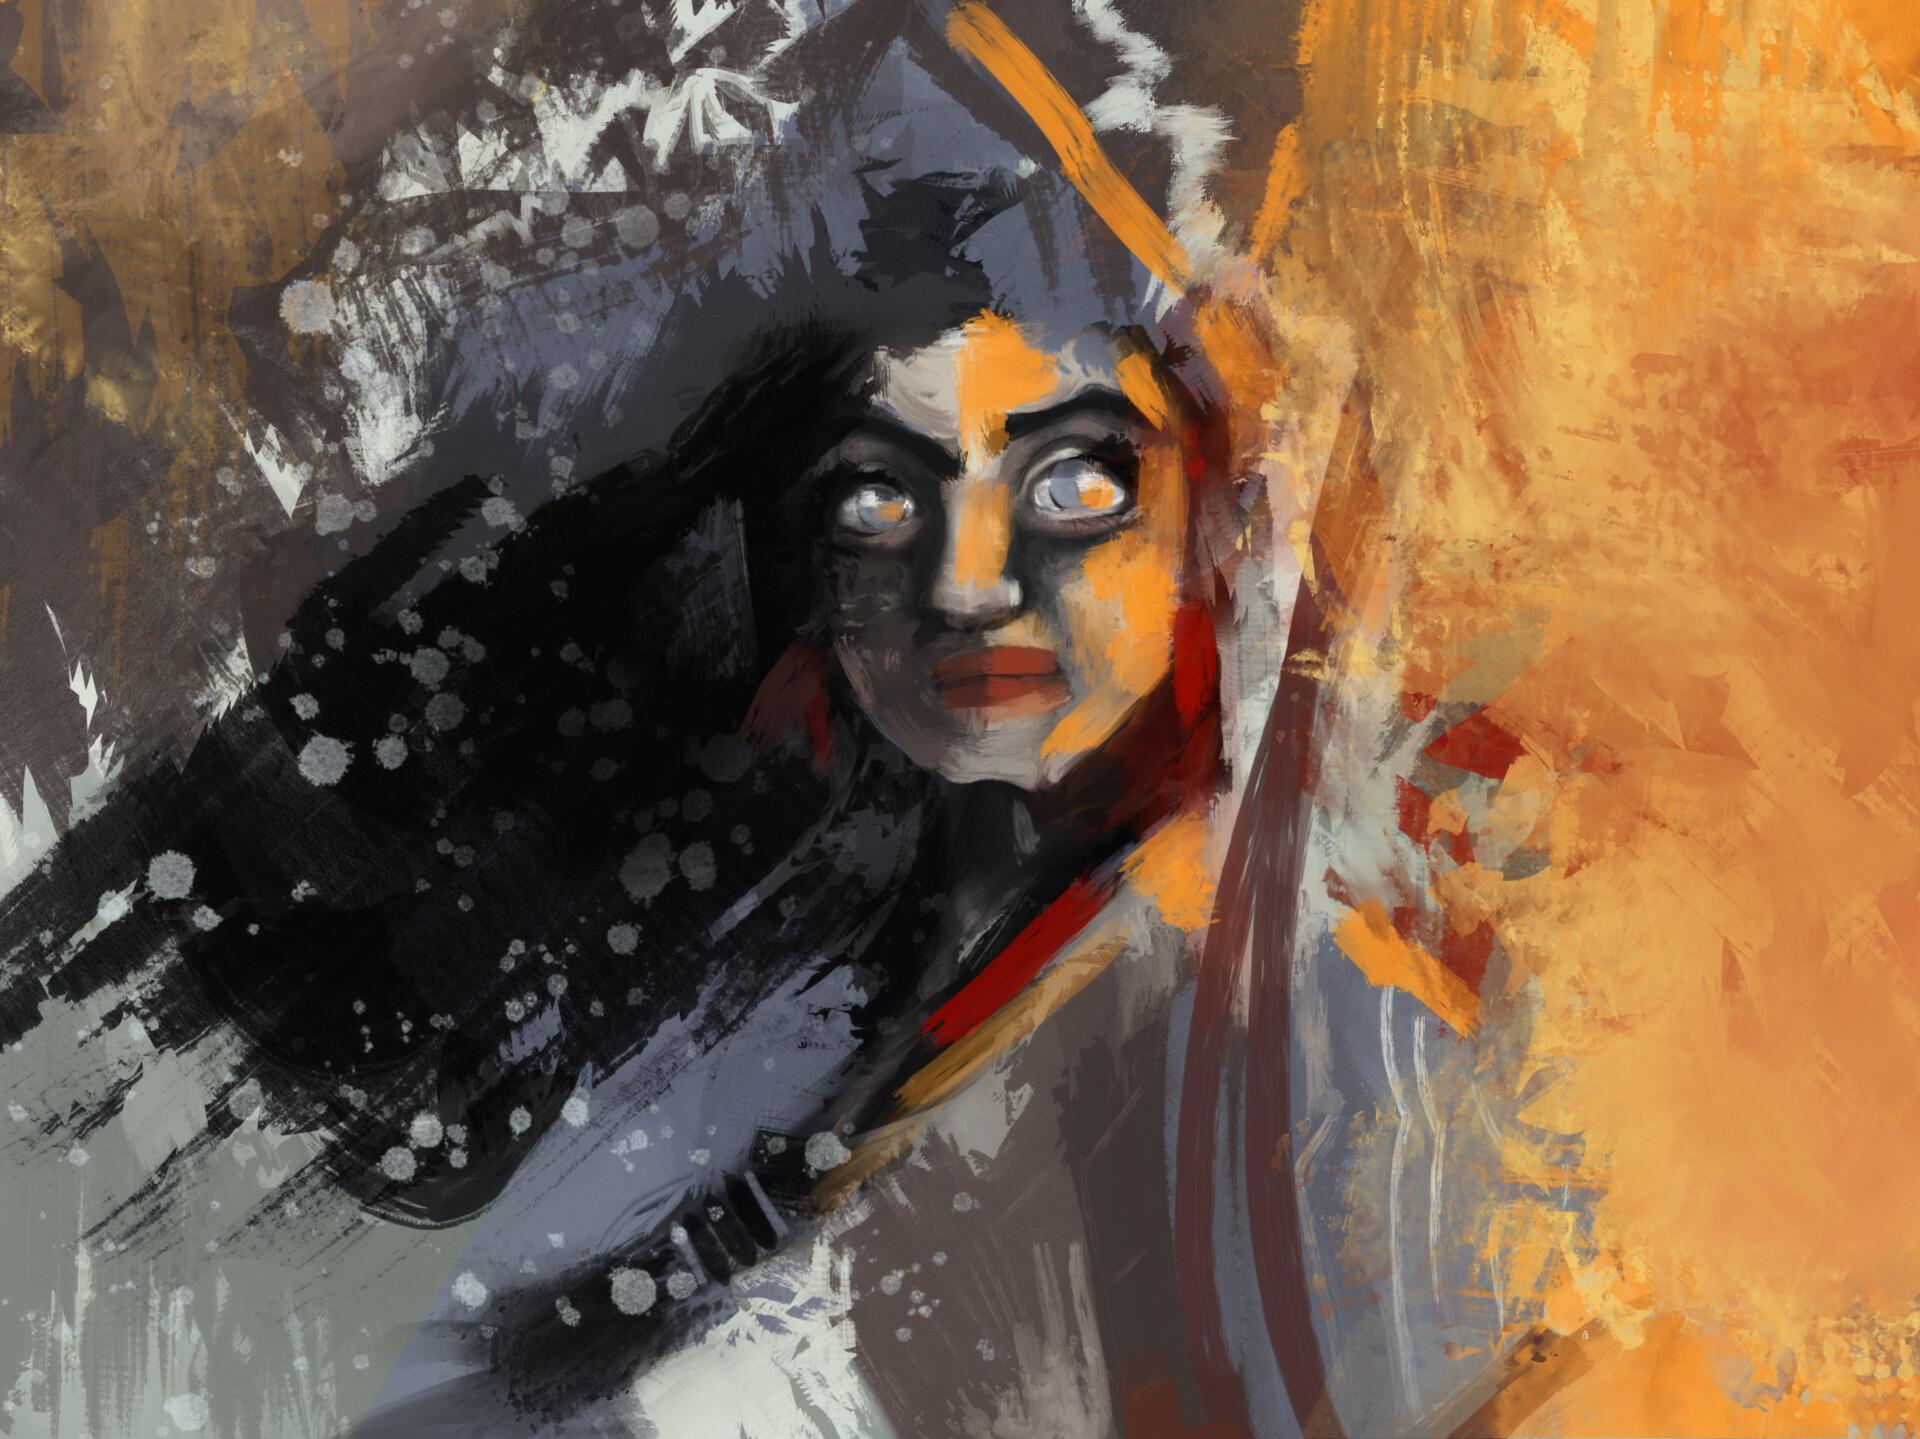 Mccal joy untitled artwork 102